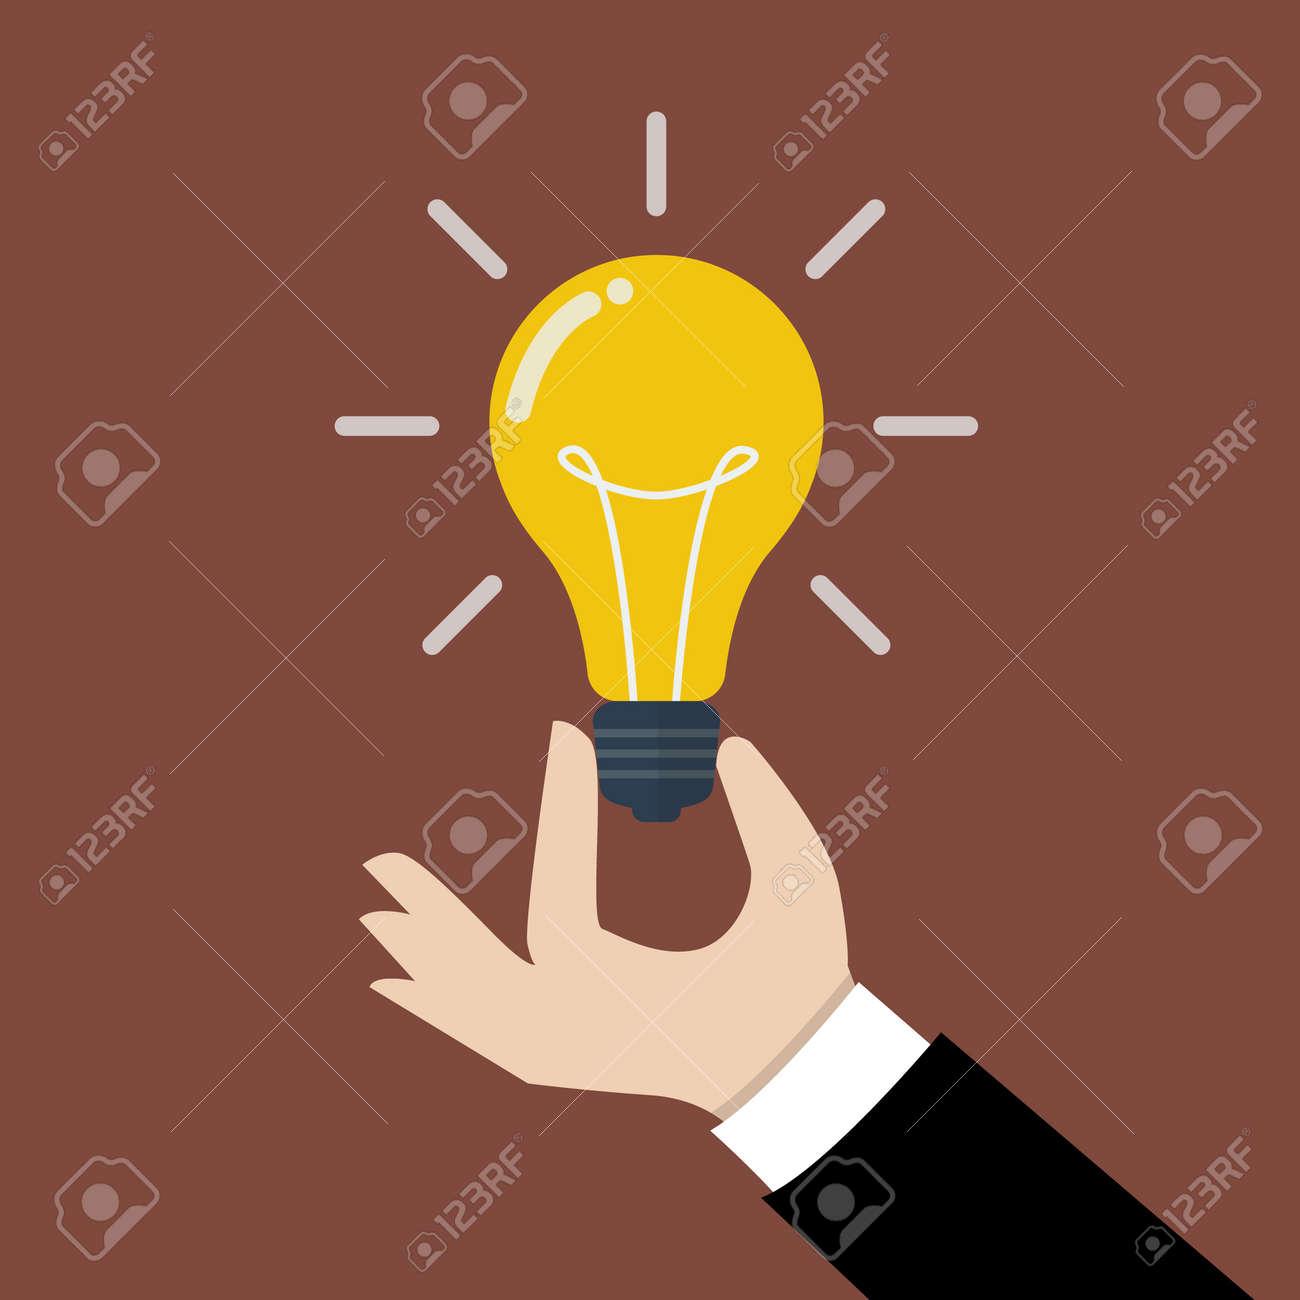 Hand holding light bulb. Business idea concept. - 43296357